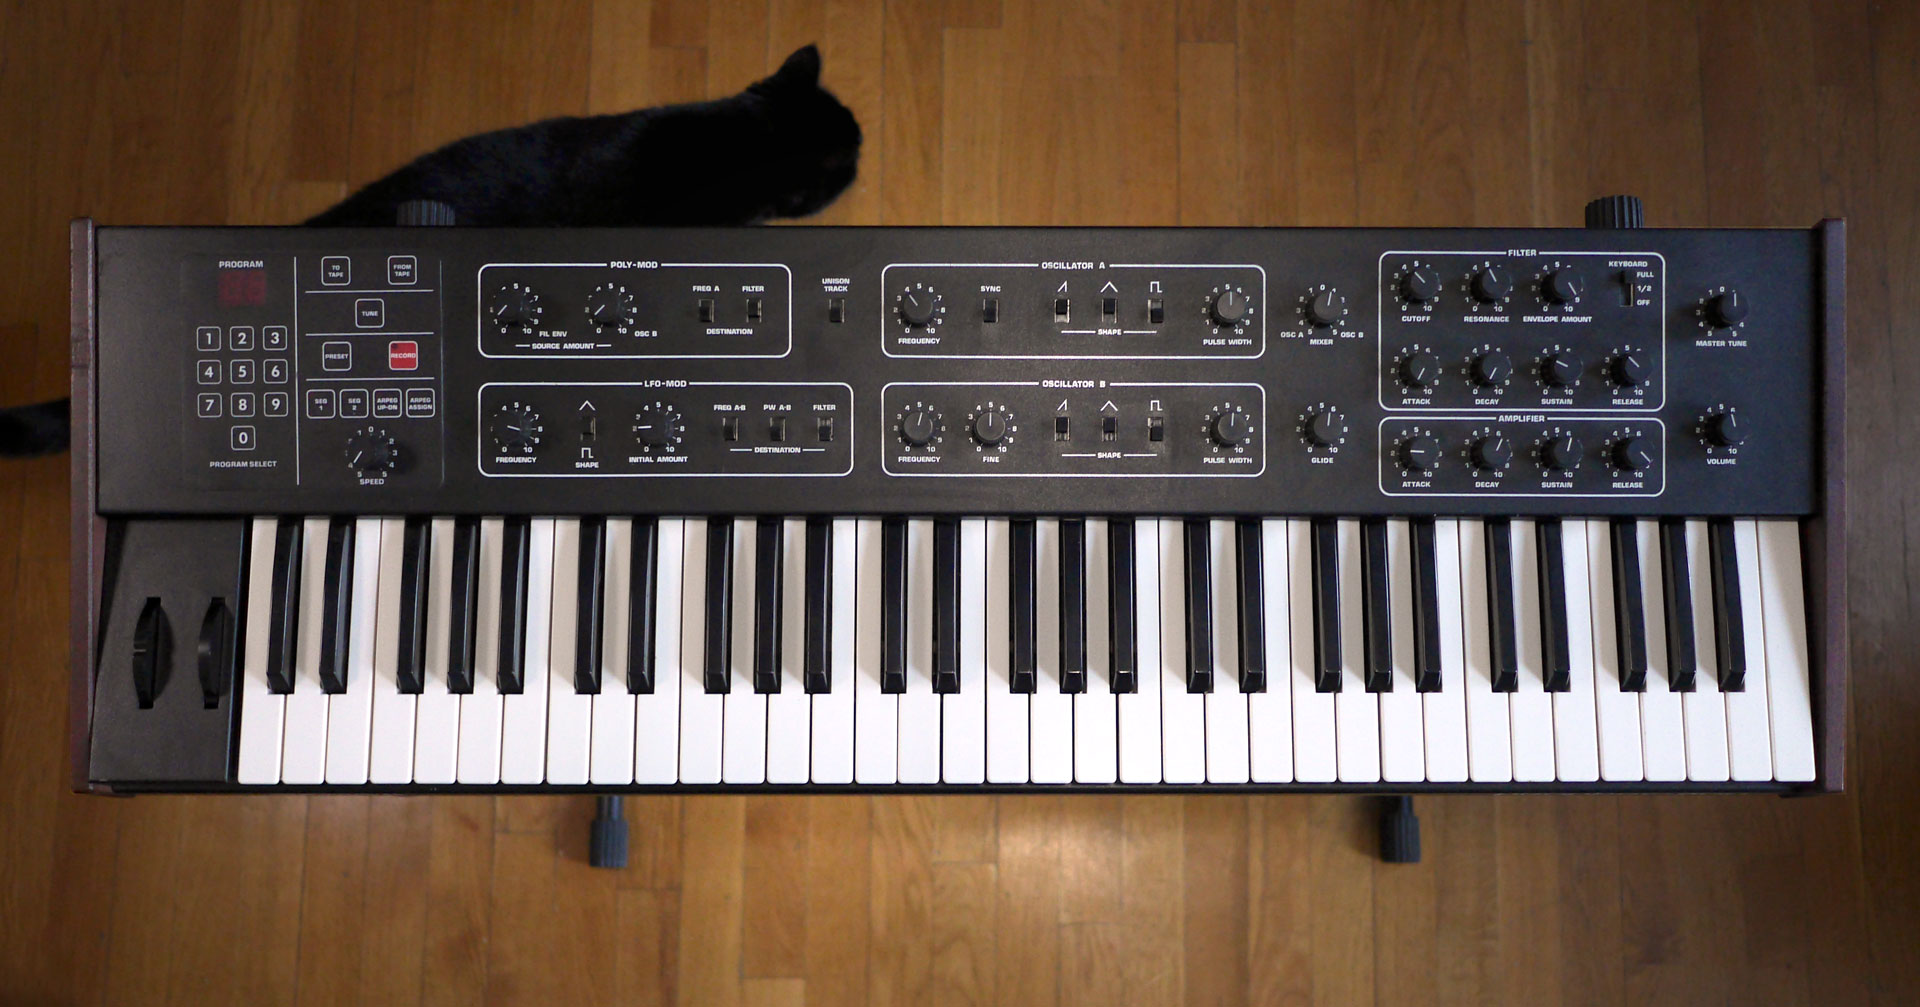 microcontrollers_prophet-600-w-cat-1920.jpg